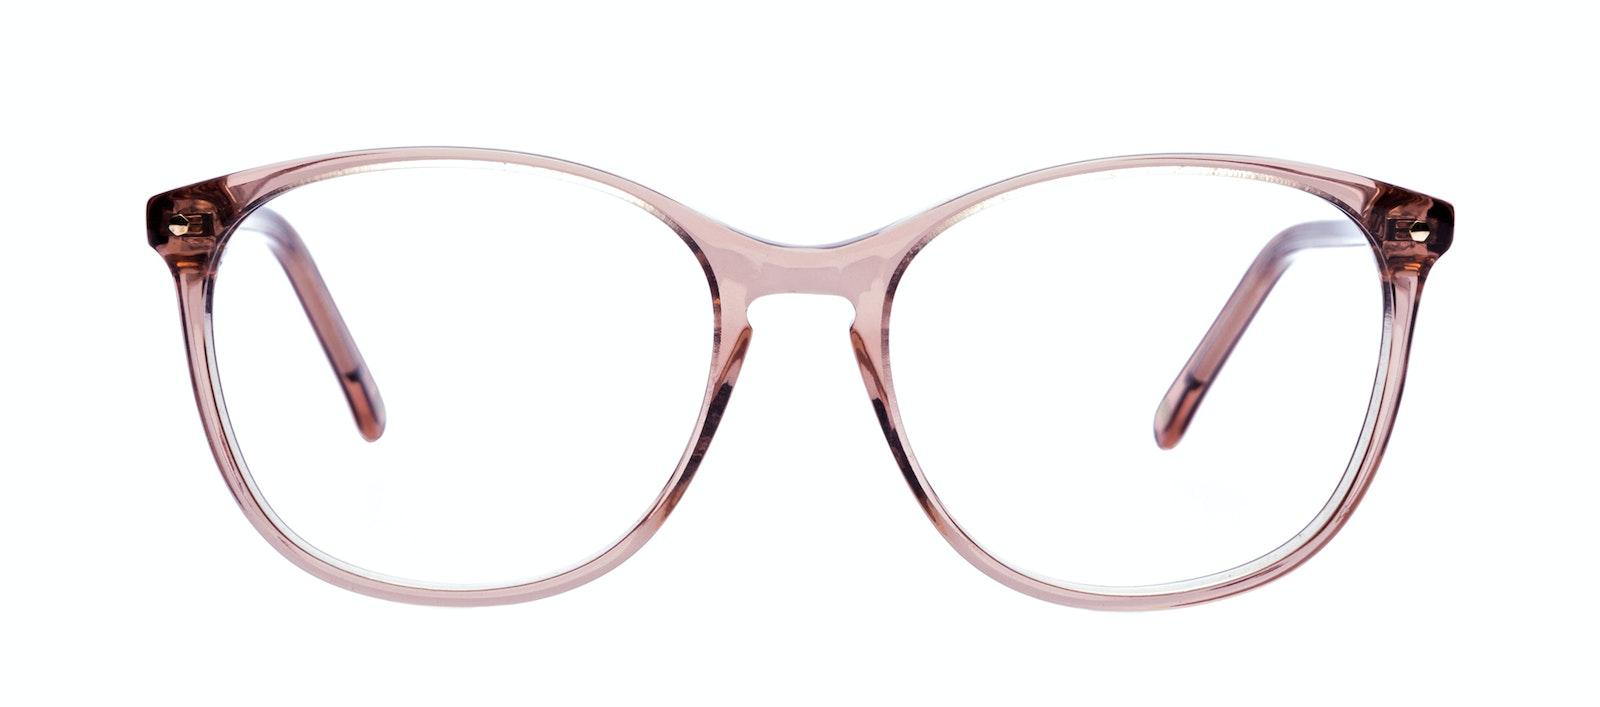 7437f811d782f Affordable Fashion Glasses Rectangle Square Round Eyeglasses Women Nadine Rose  Front